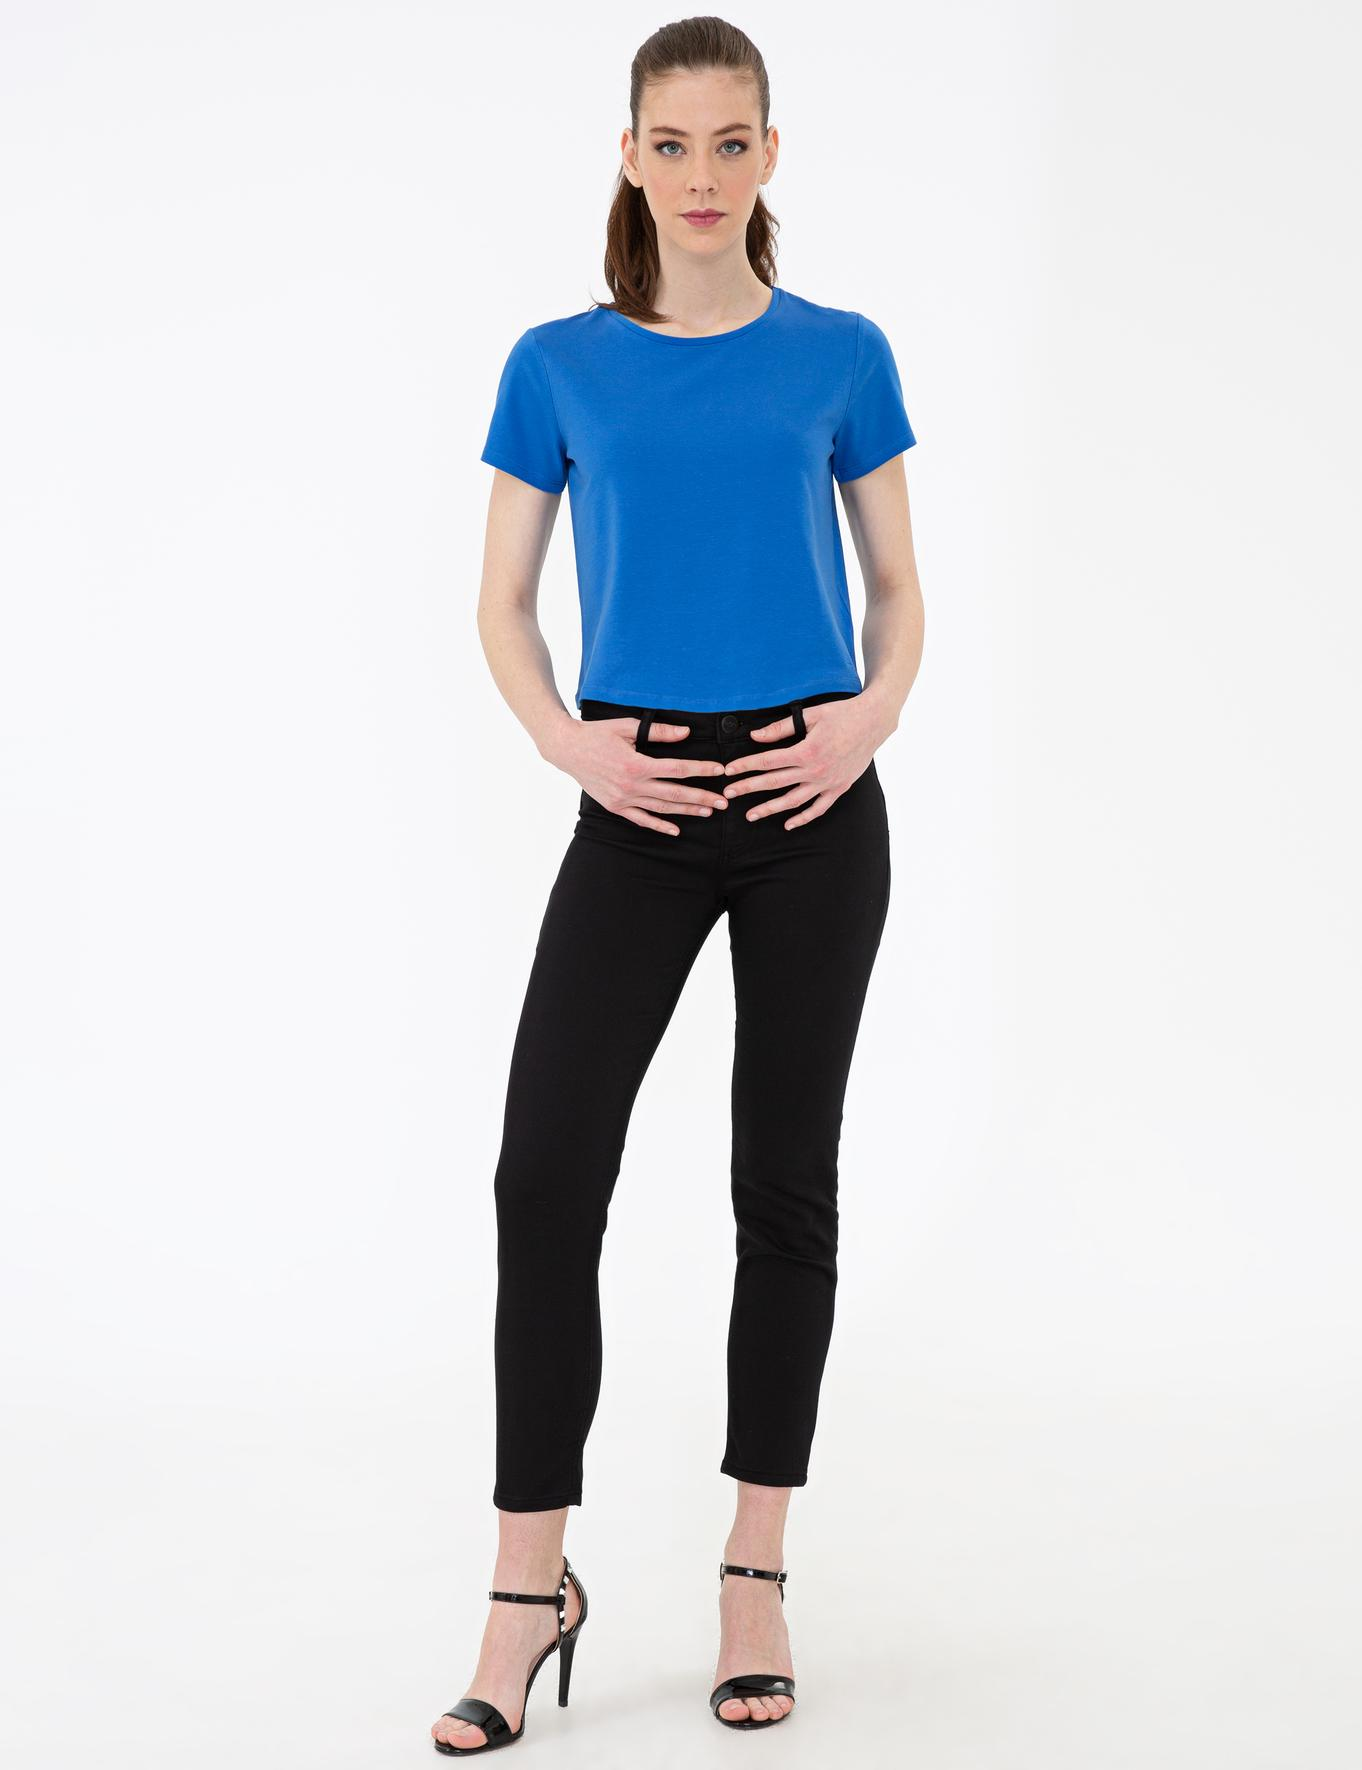 Sax Crop Top Fit T-Shirt